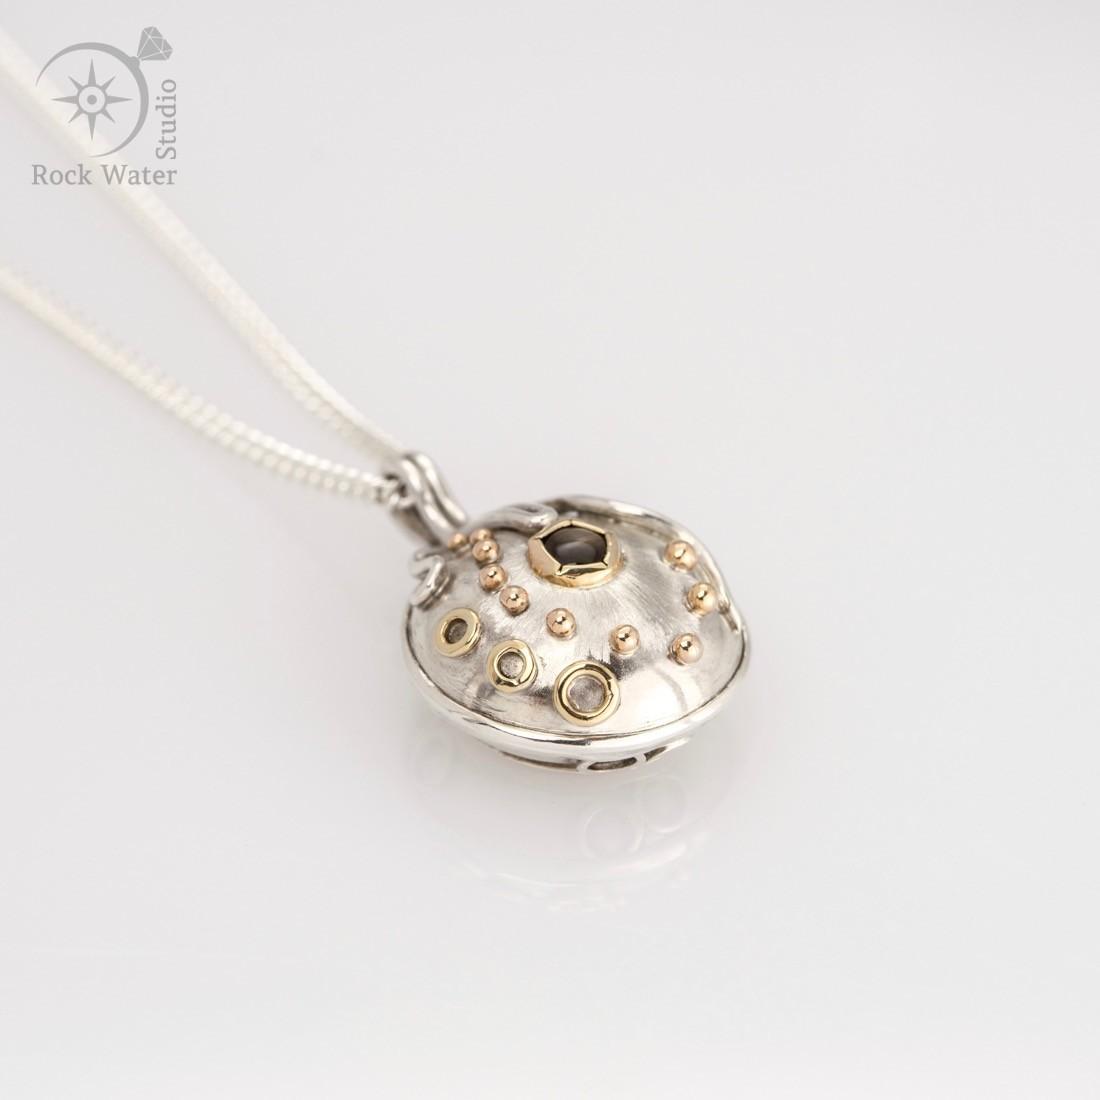 Guiding star compass necklace black star sapphire compass necklace graduation gift g506 aloadofball Choice Image